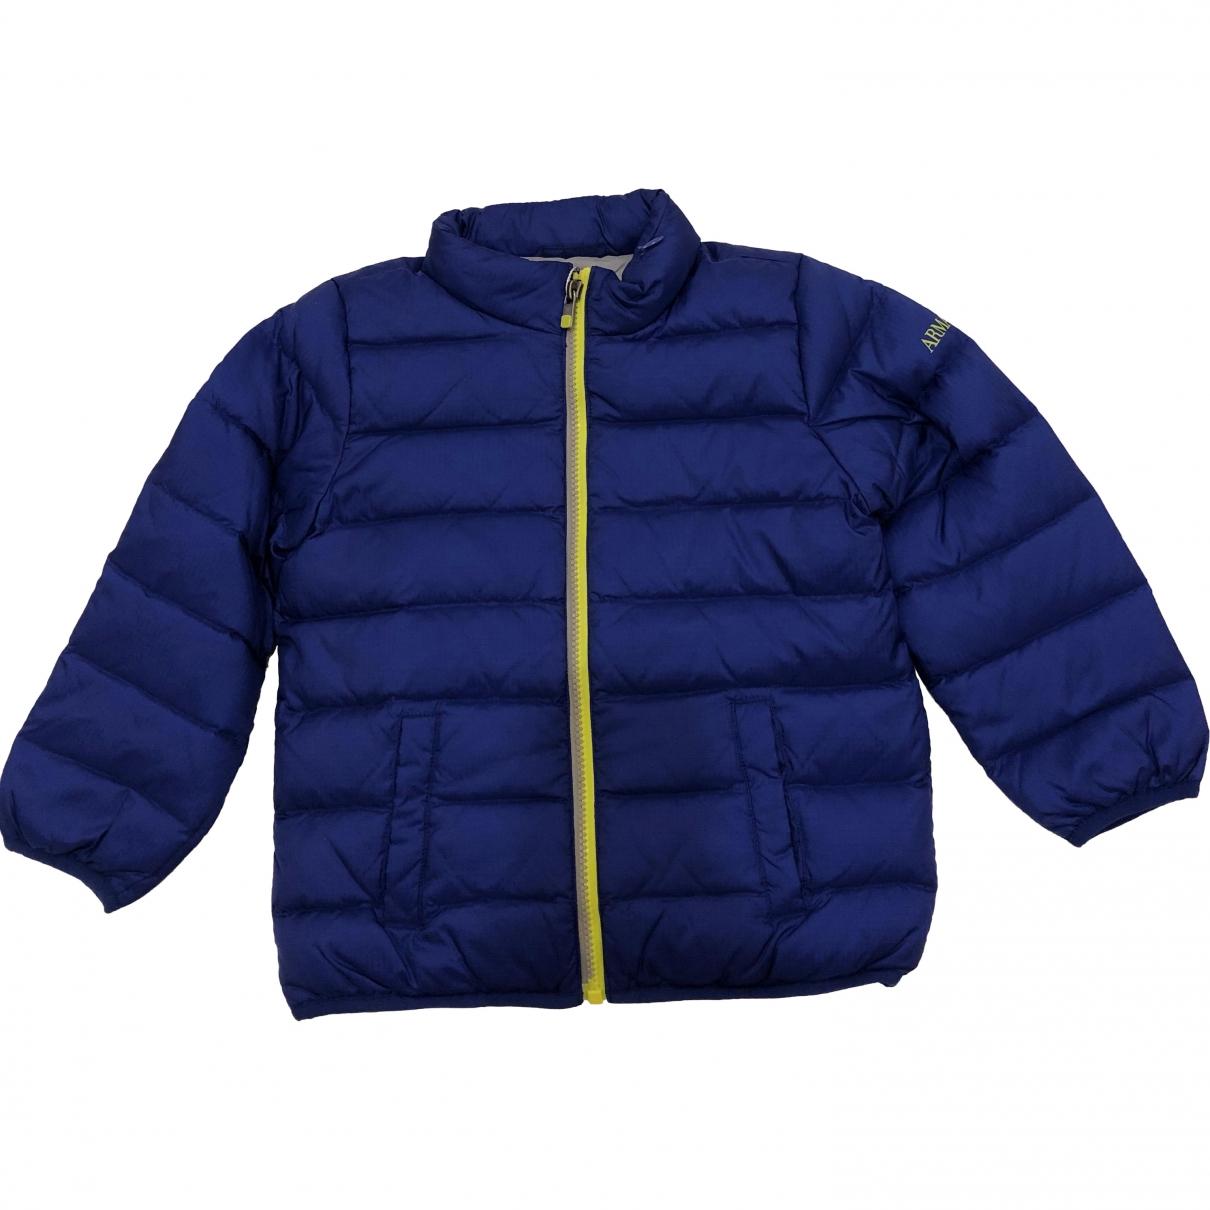 Armani Jeans \N Jacke, Maentel in  Blau Synthetik